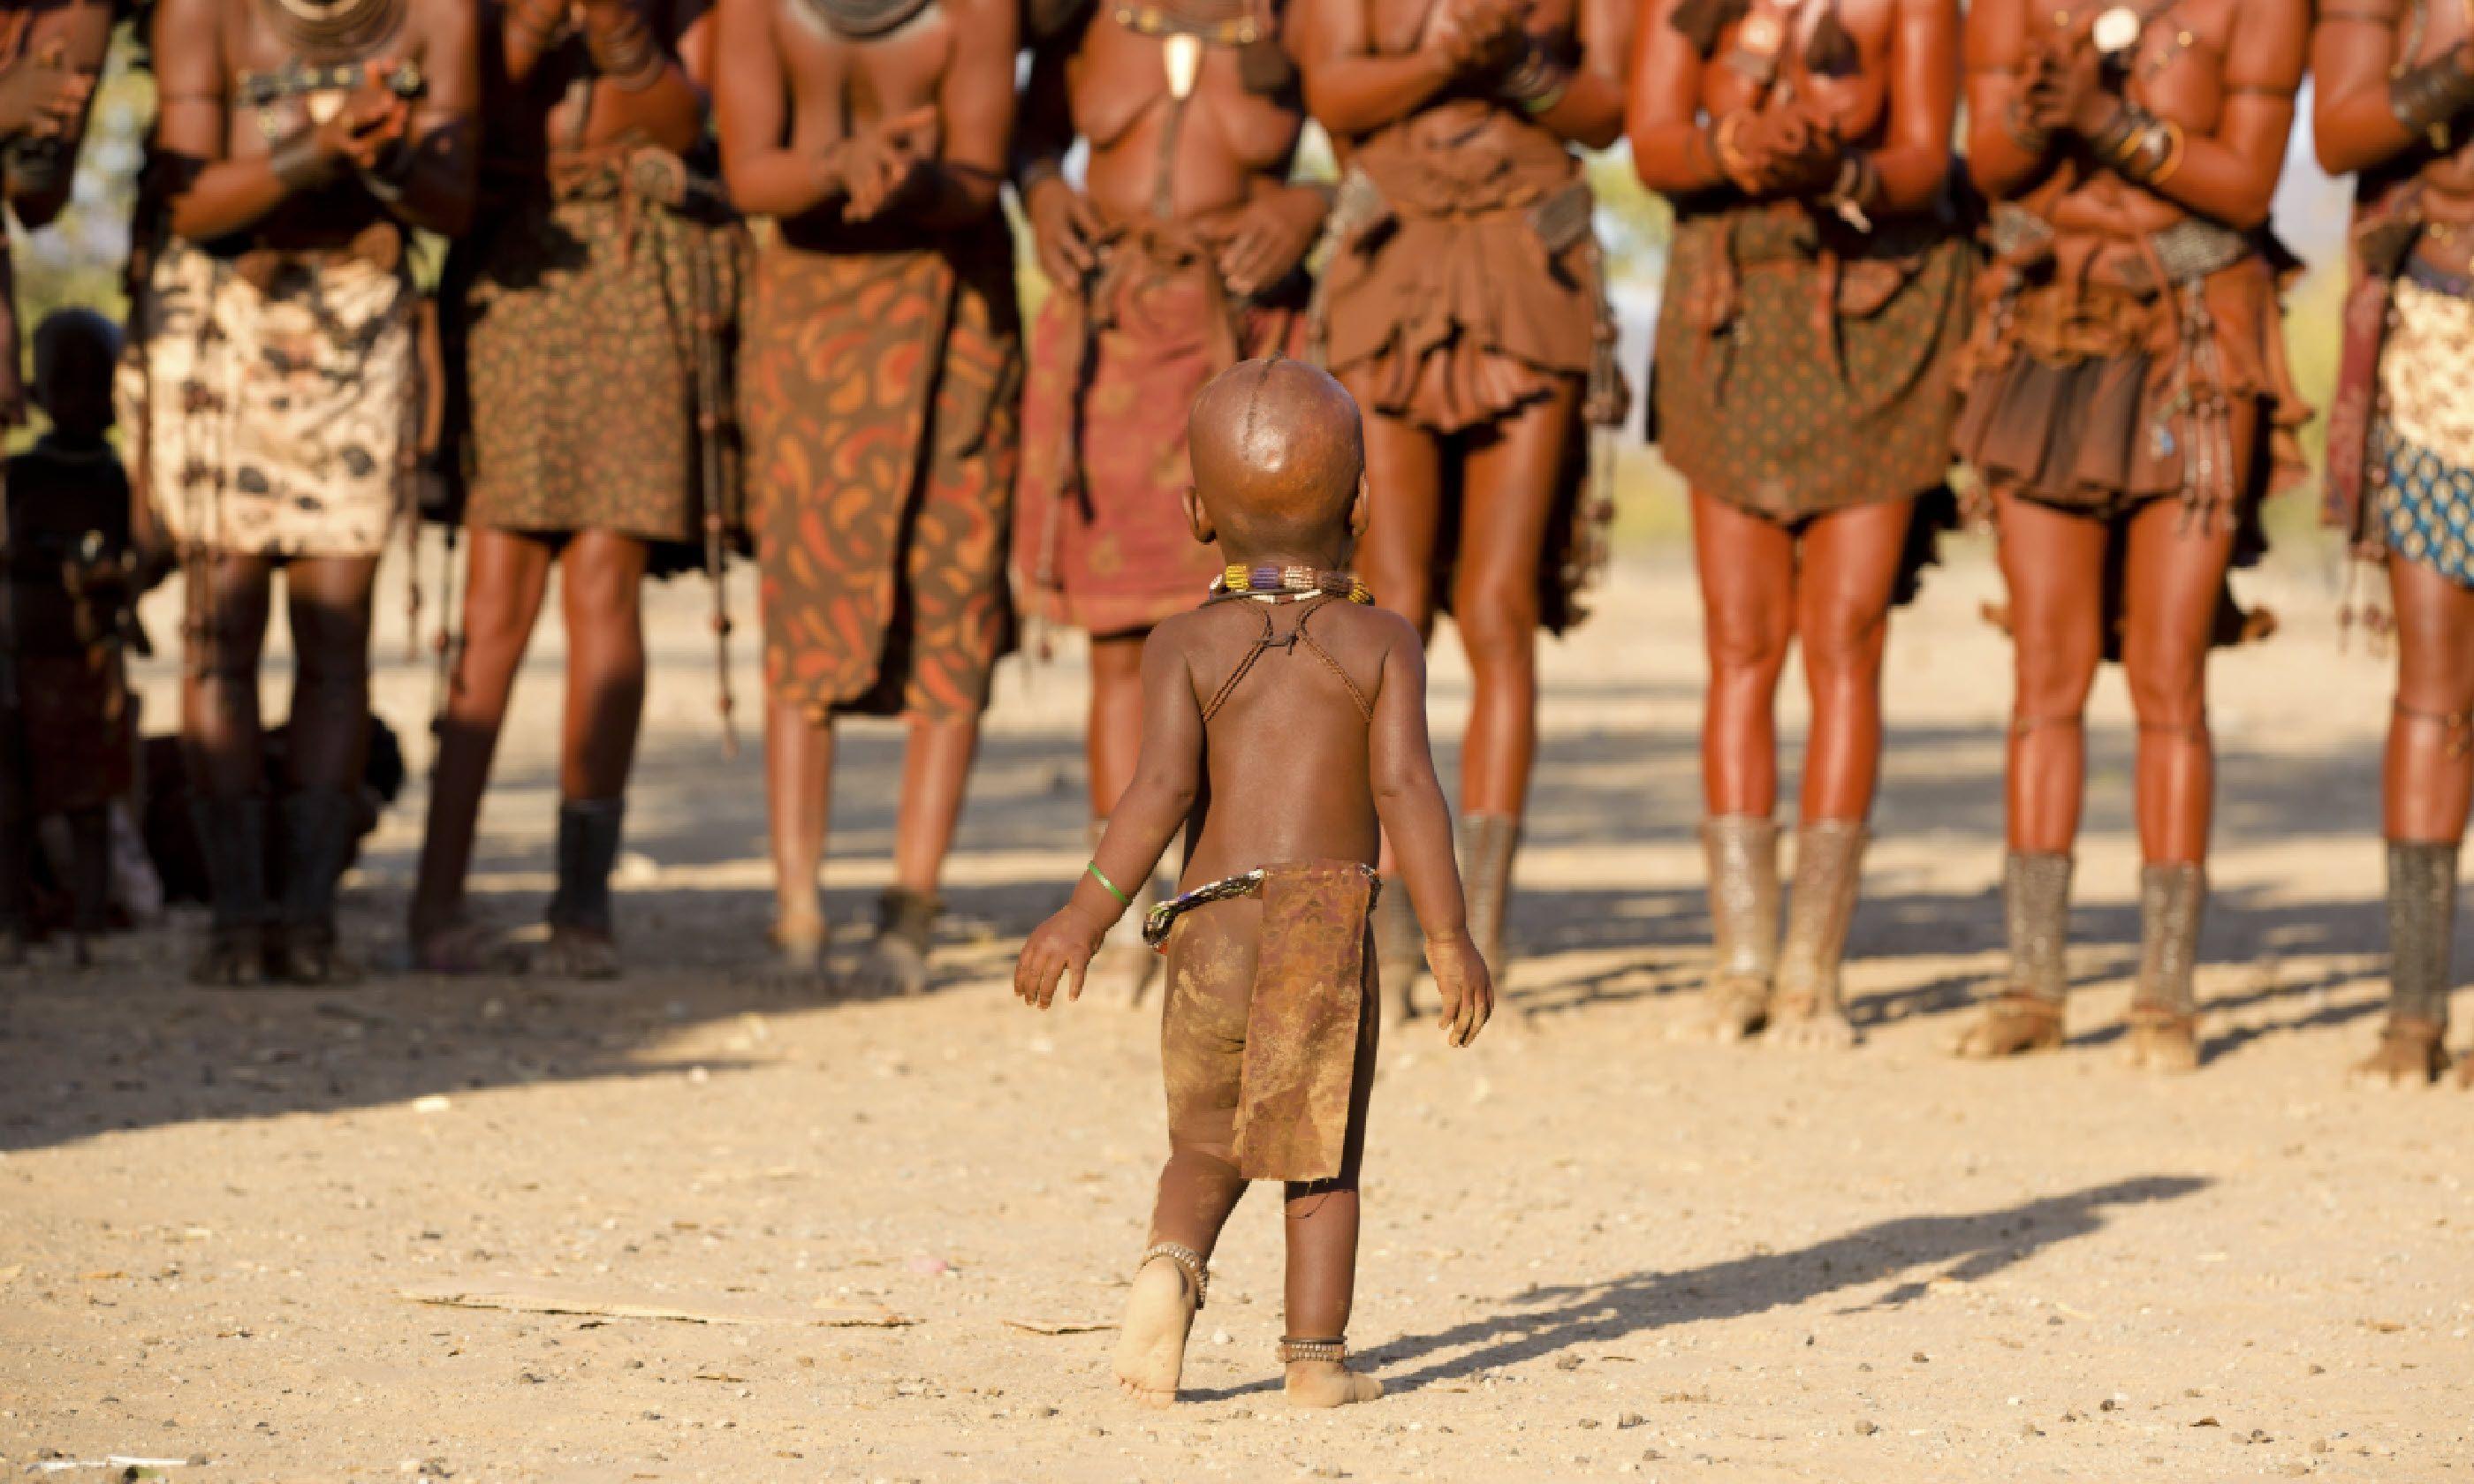 Himba women dancing and clapping (Shutterstock)